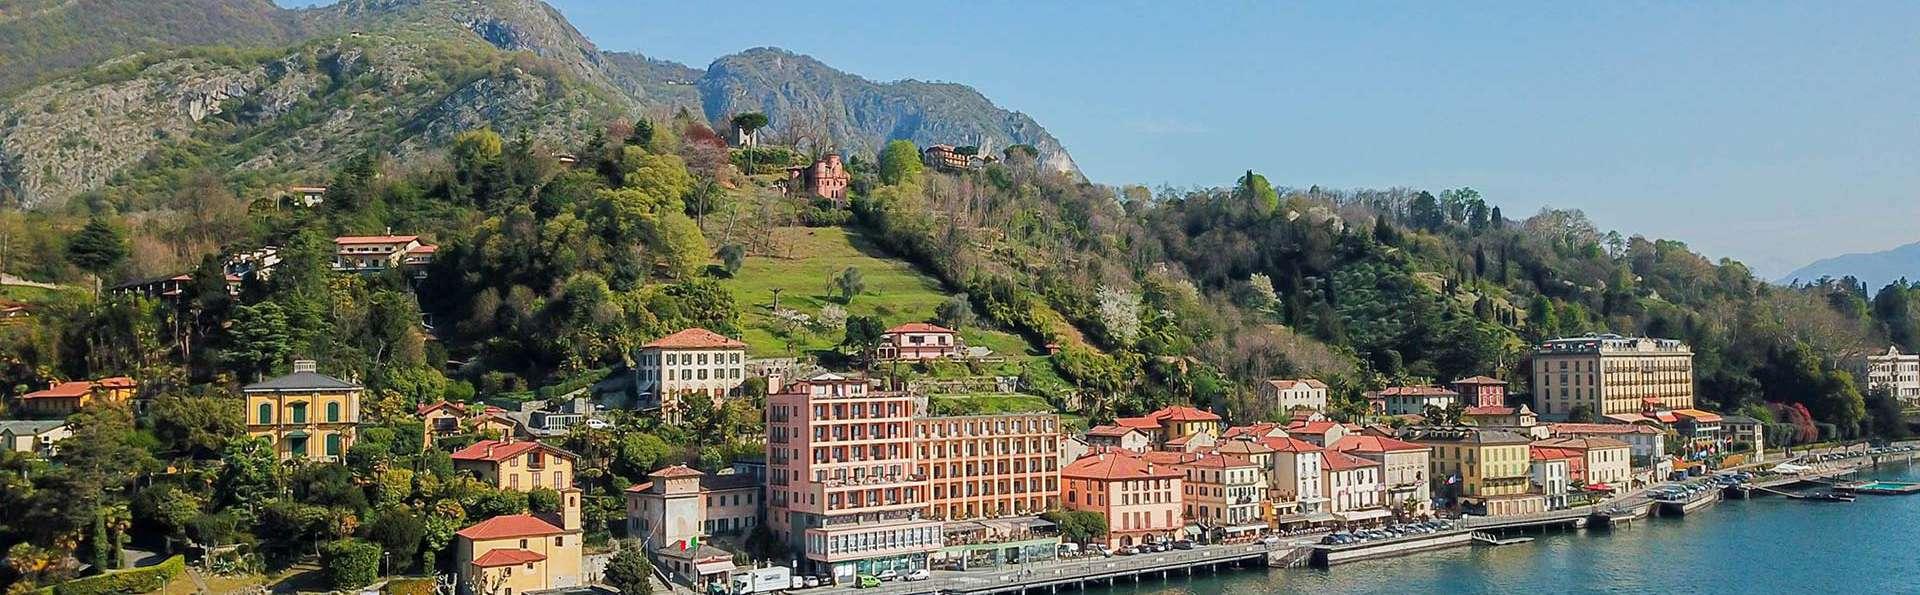 Hotel Bazzoni - EDIT_FRONT_01.jpg